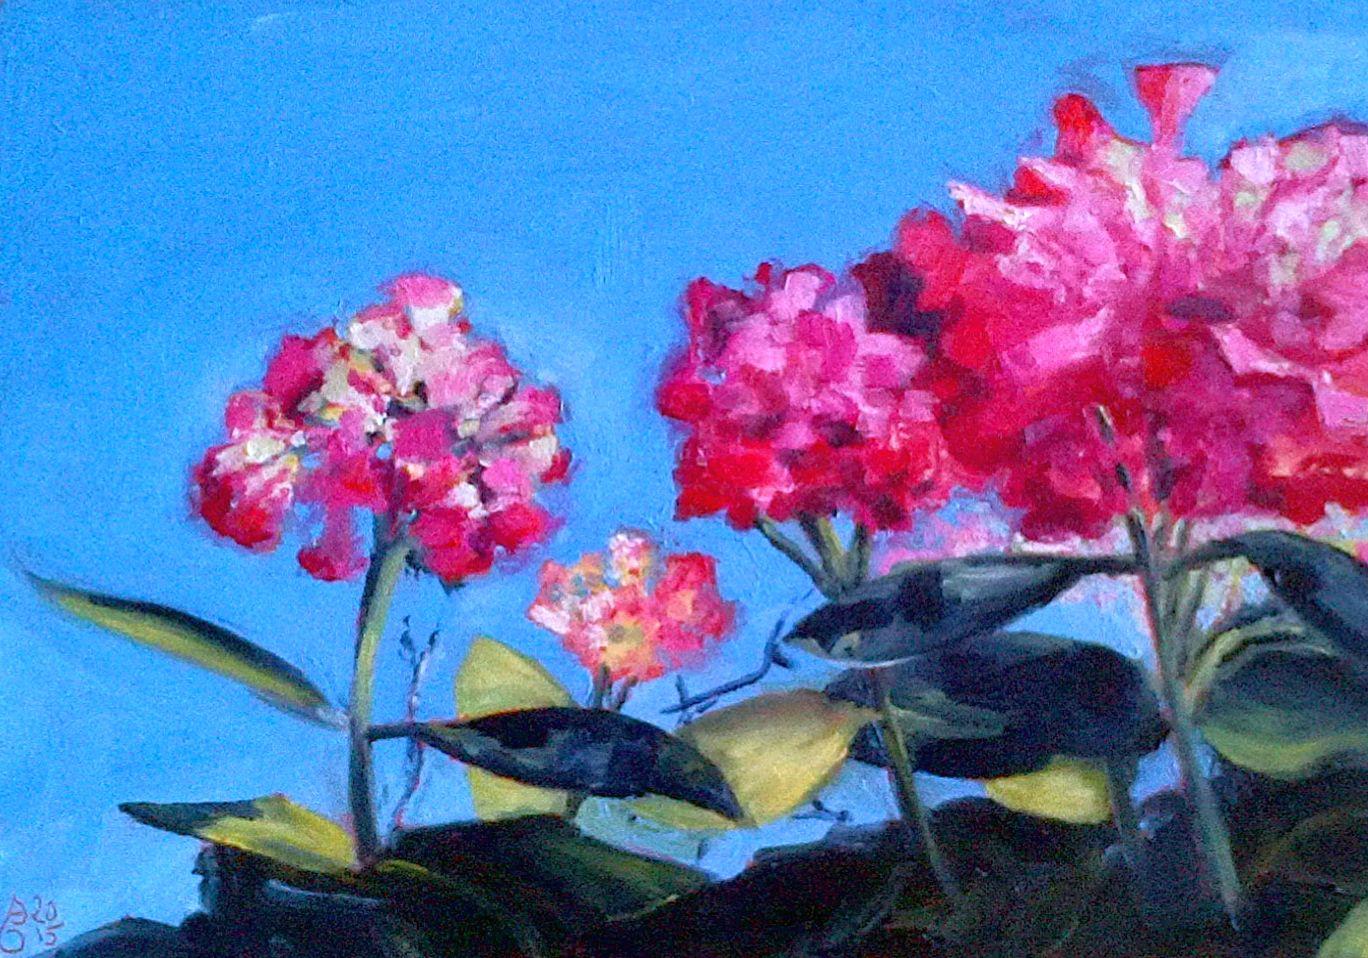 Hortensien. Öl auf Holzplatte, 30 x 21 cm. Hydrangeas. Oil on board, 11.4 x 8.3 in.